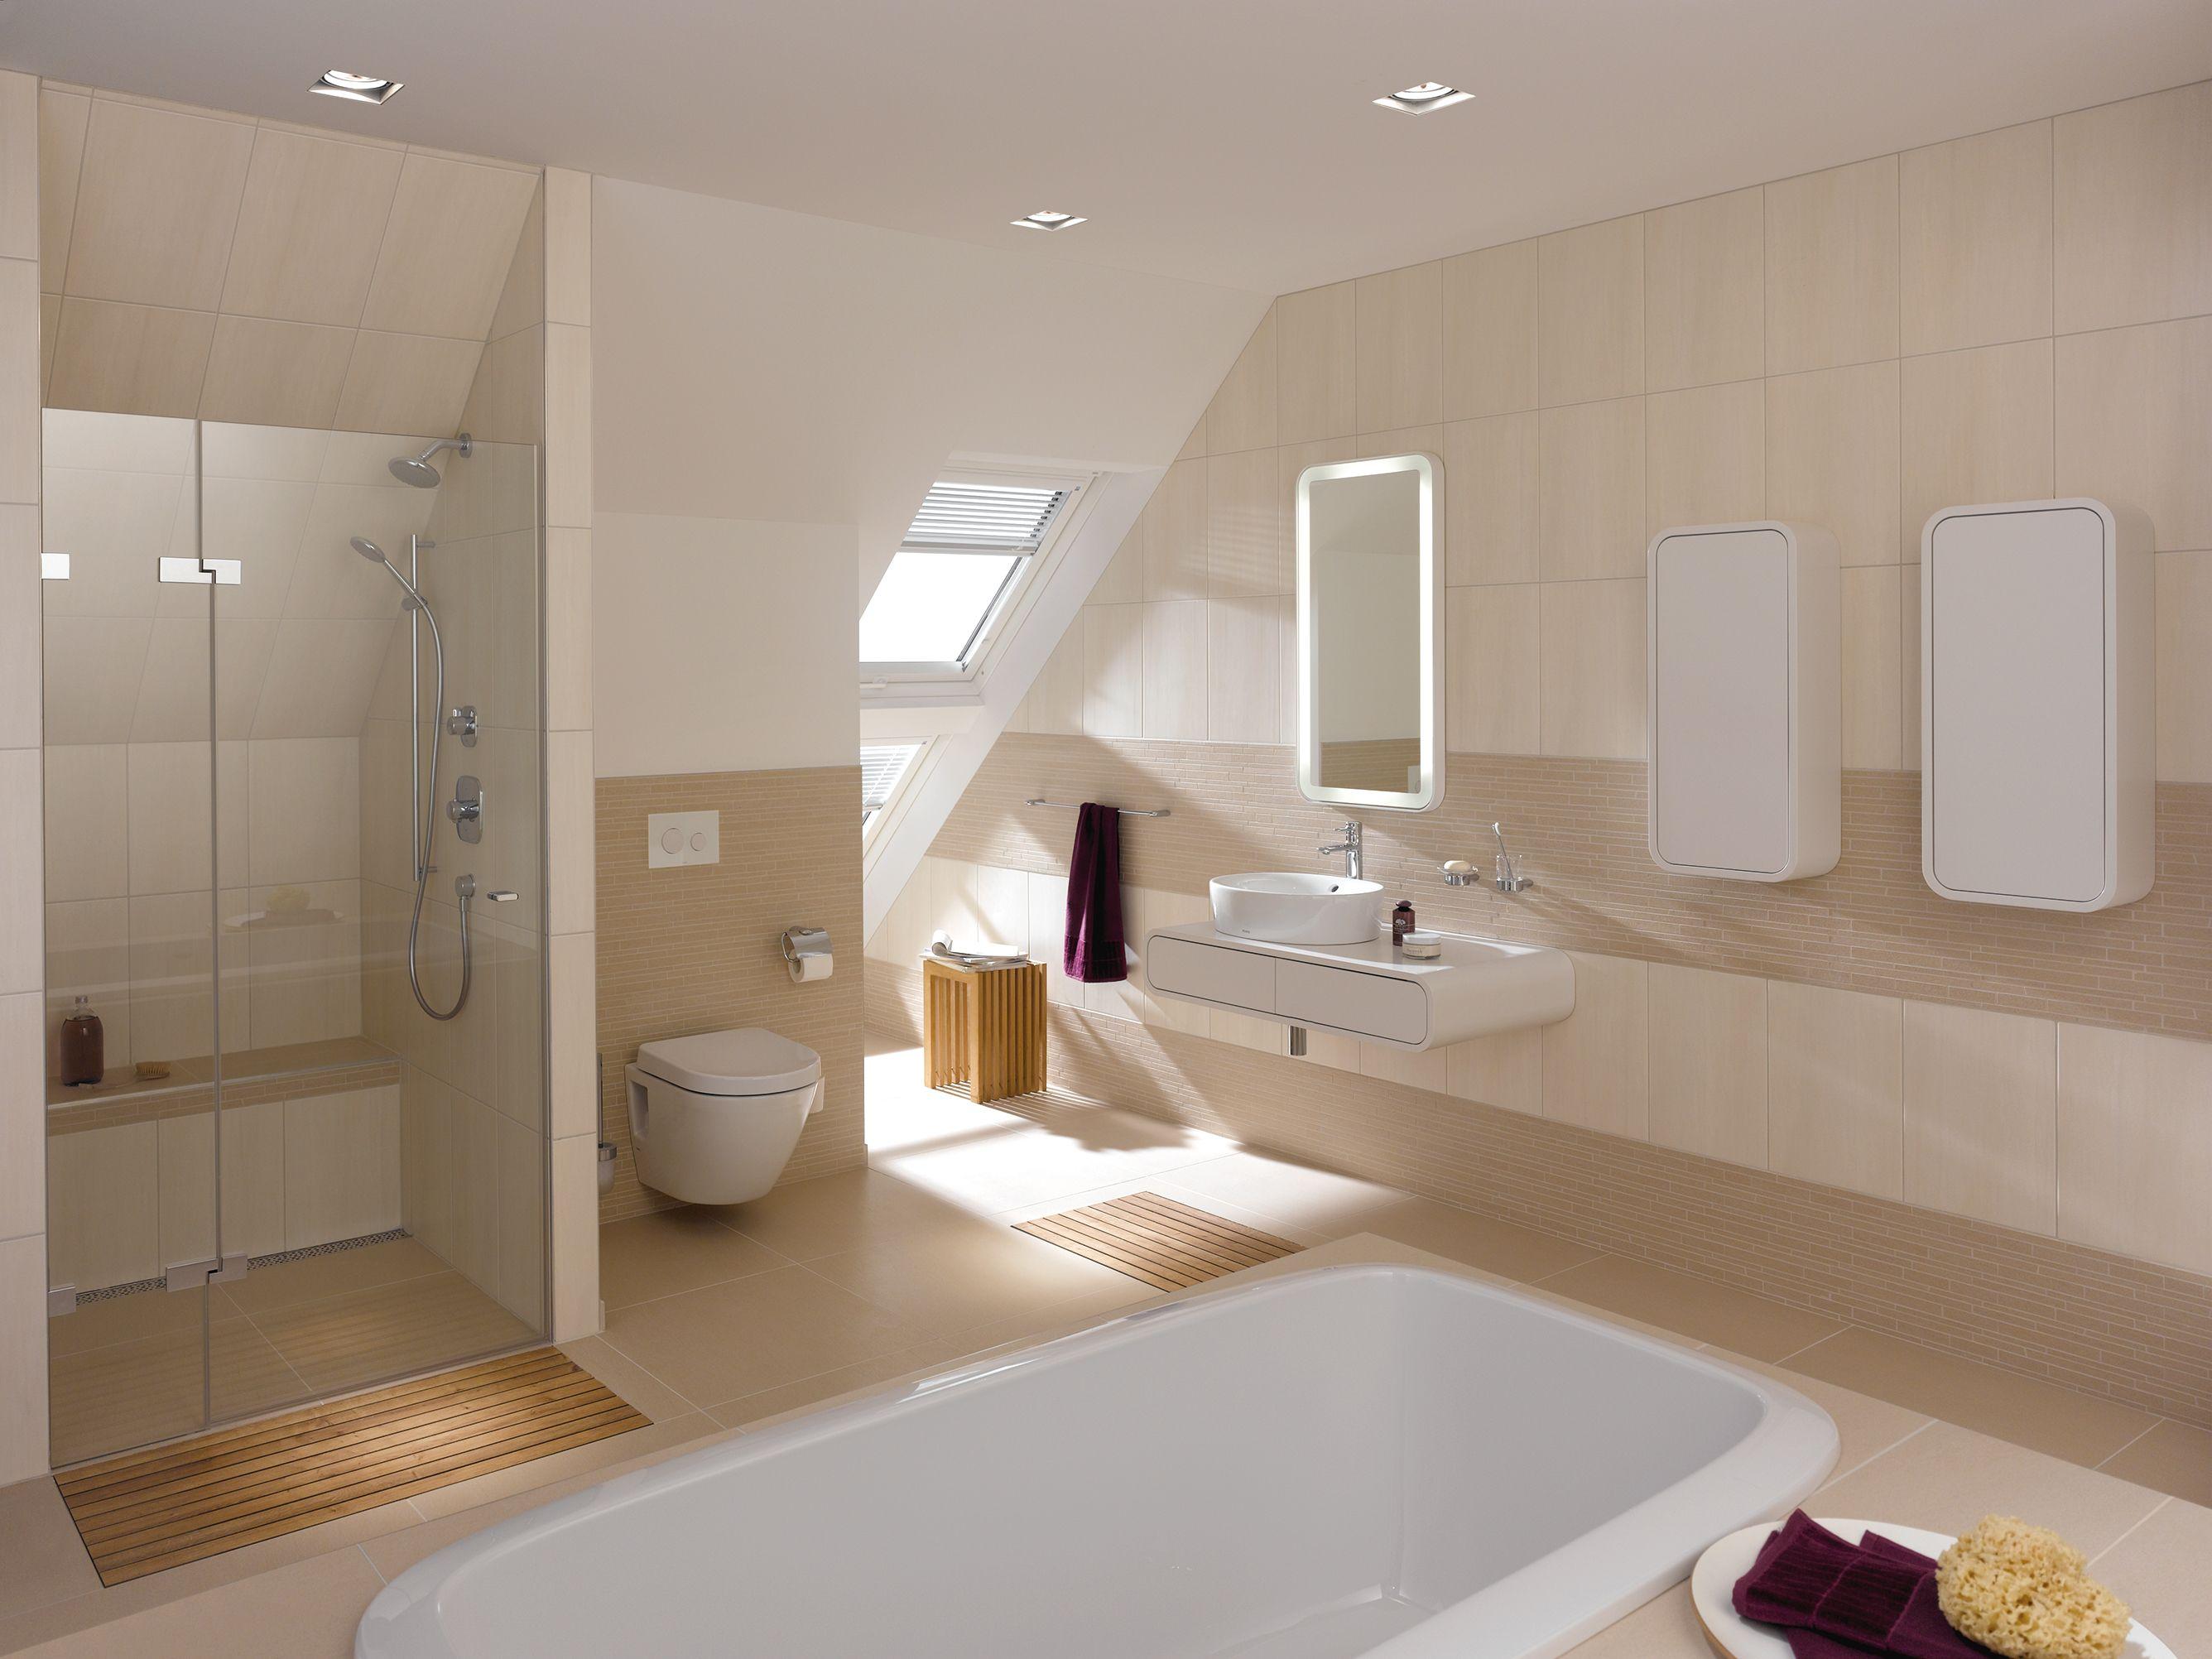 Aco Showerdrain Lightline Blue Badezimmer Dachschrage Badezimmer Badezimmer Mit Dusche